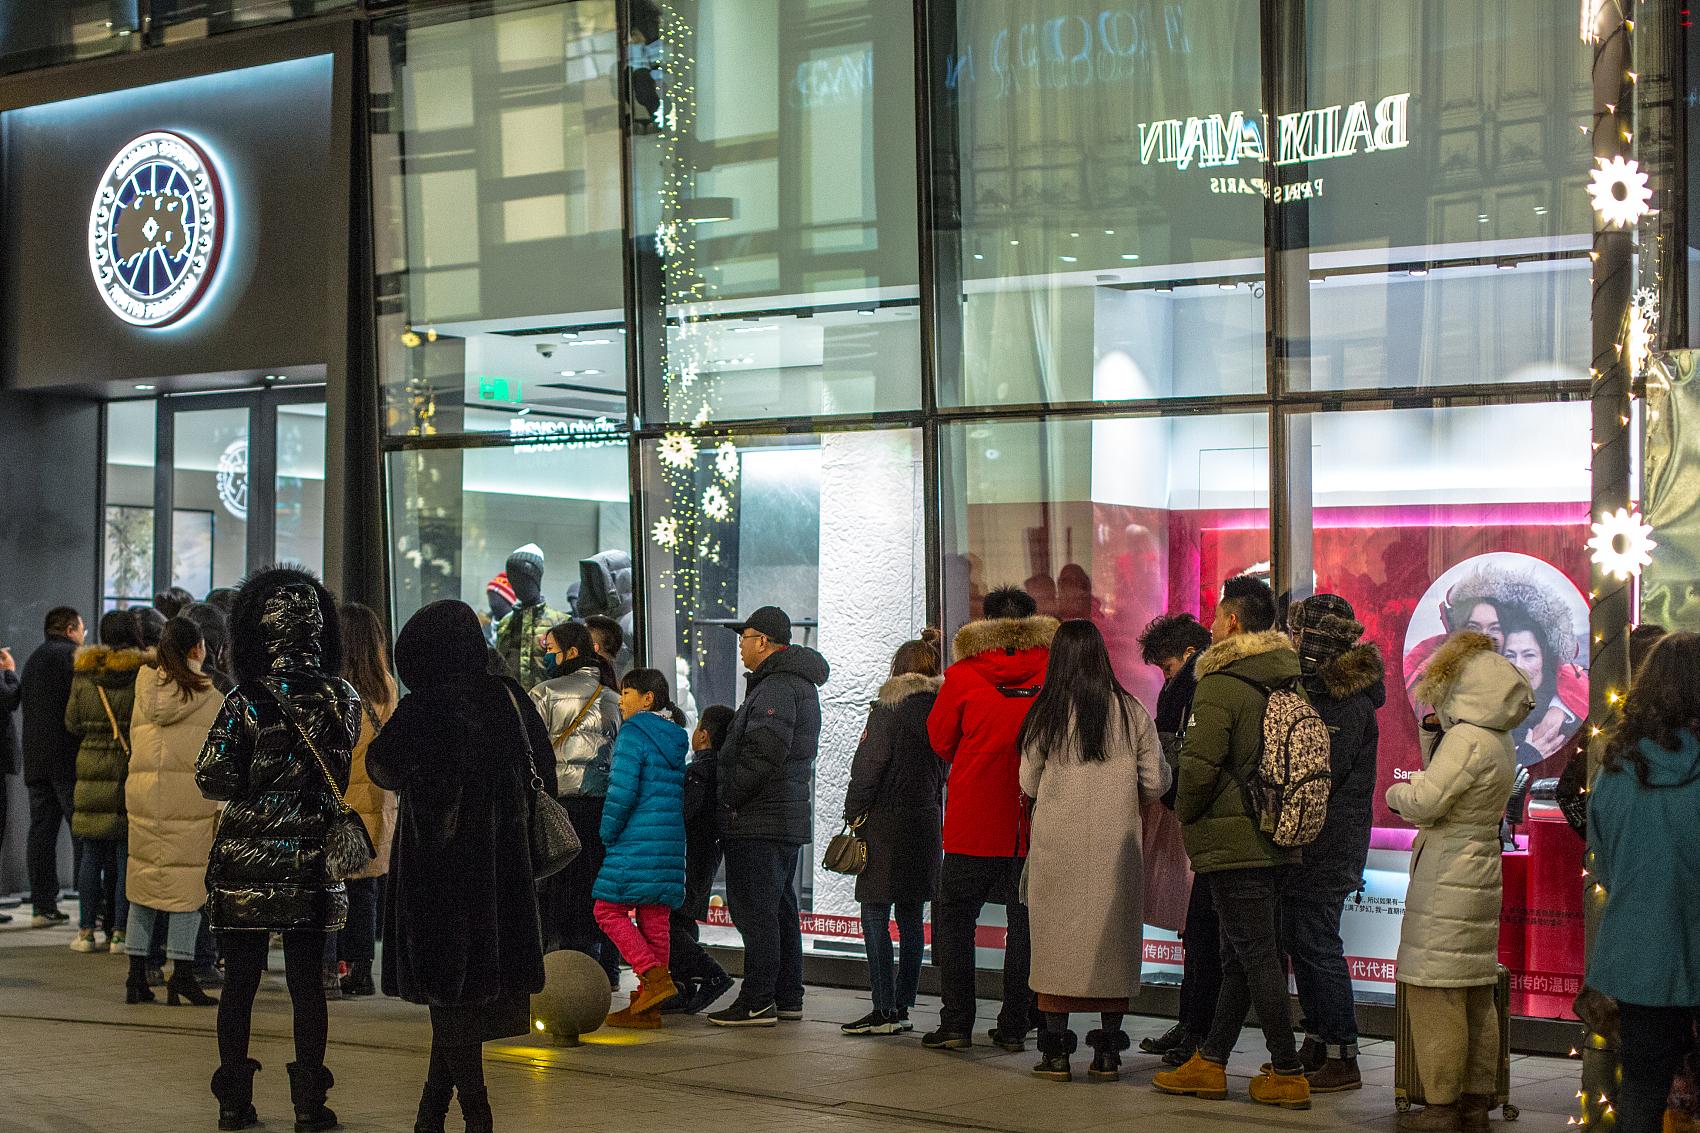 Canada Goose北京首店终于开业,门前的长龙刺激低迷股价反弹